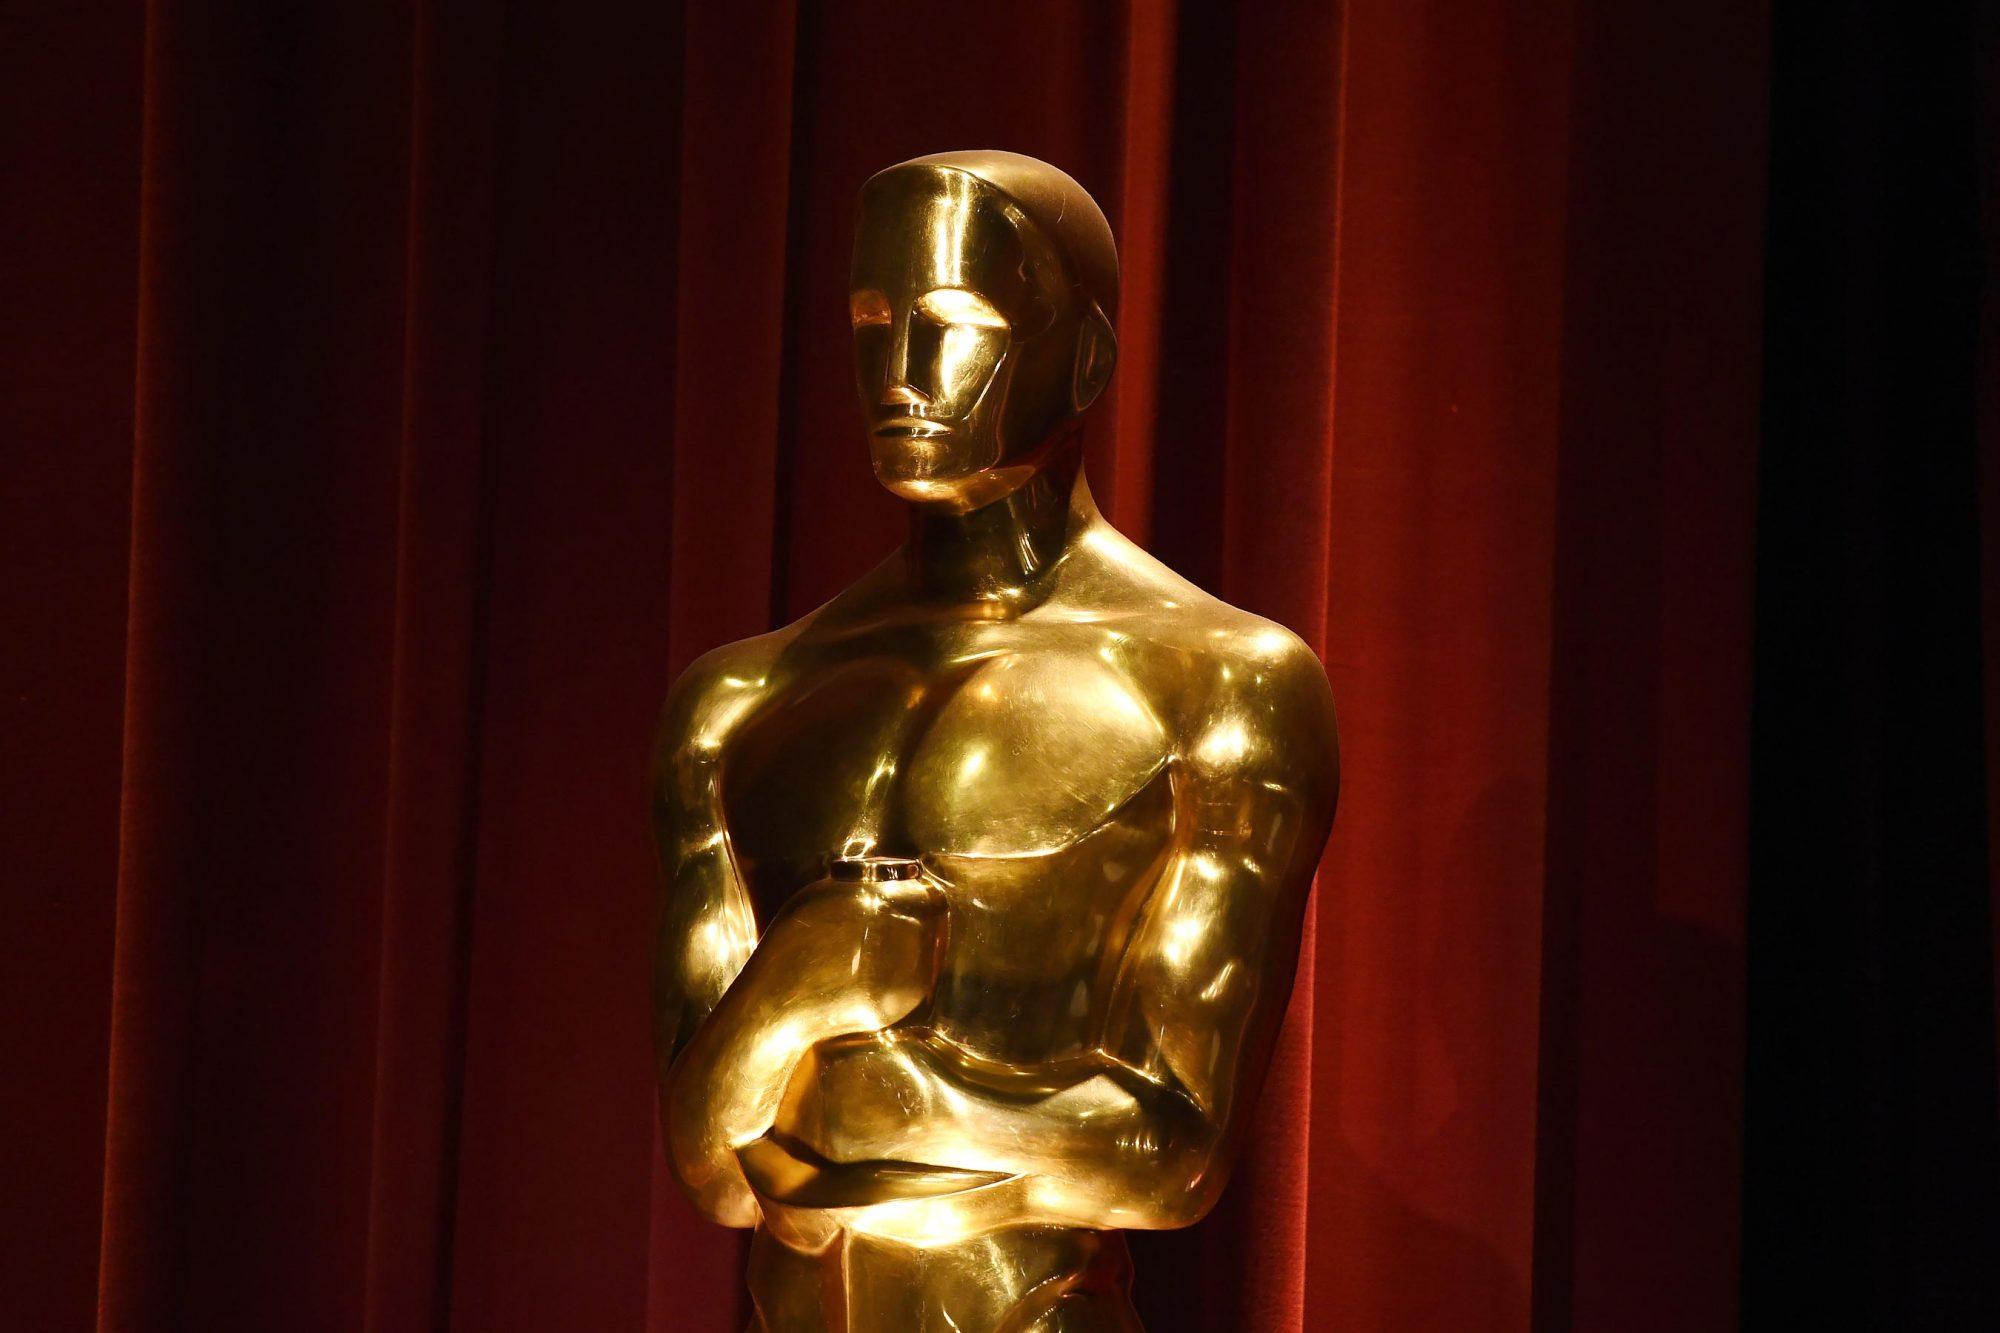 US-ENTERTAINMENT-FILM-OSCAR-NOMINATIONS